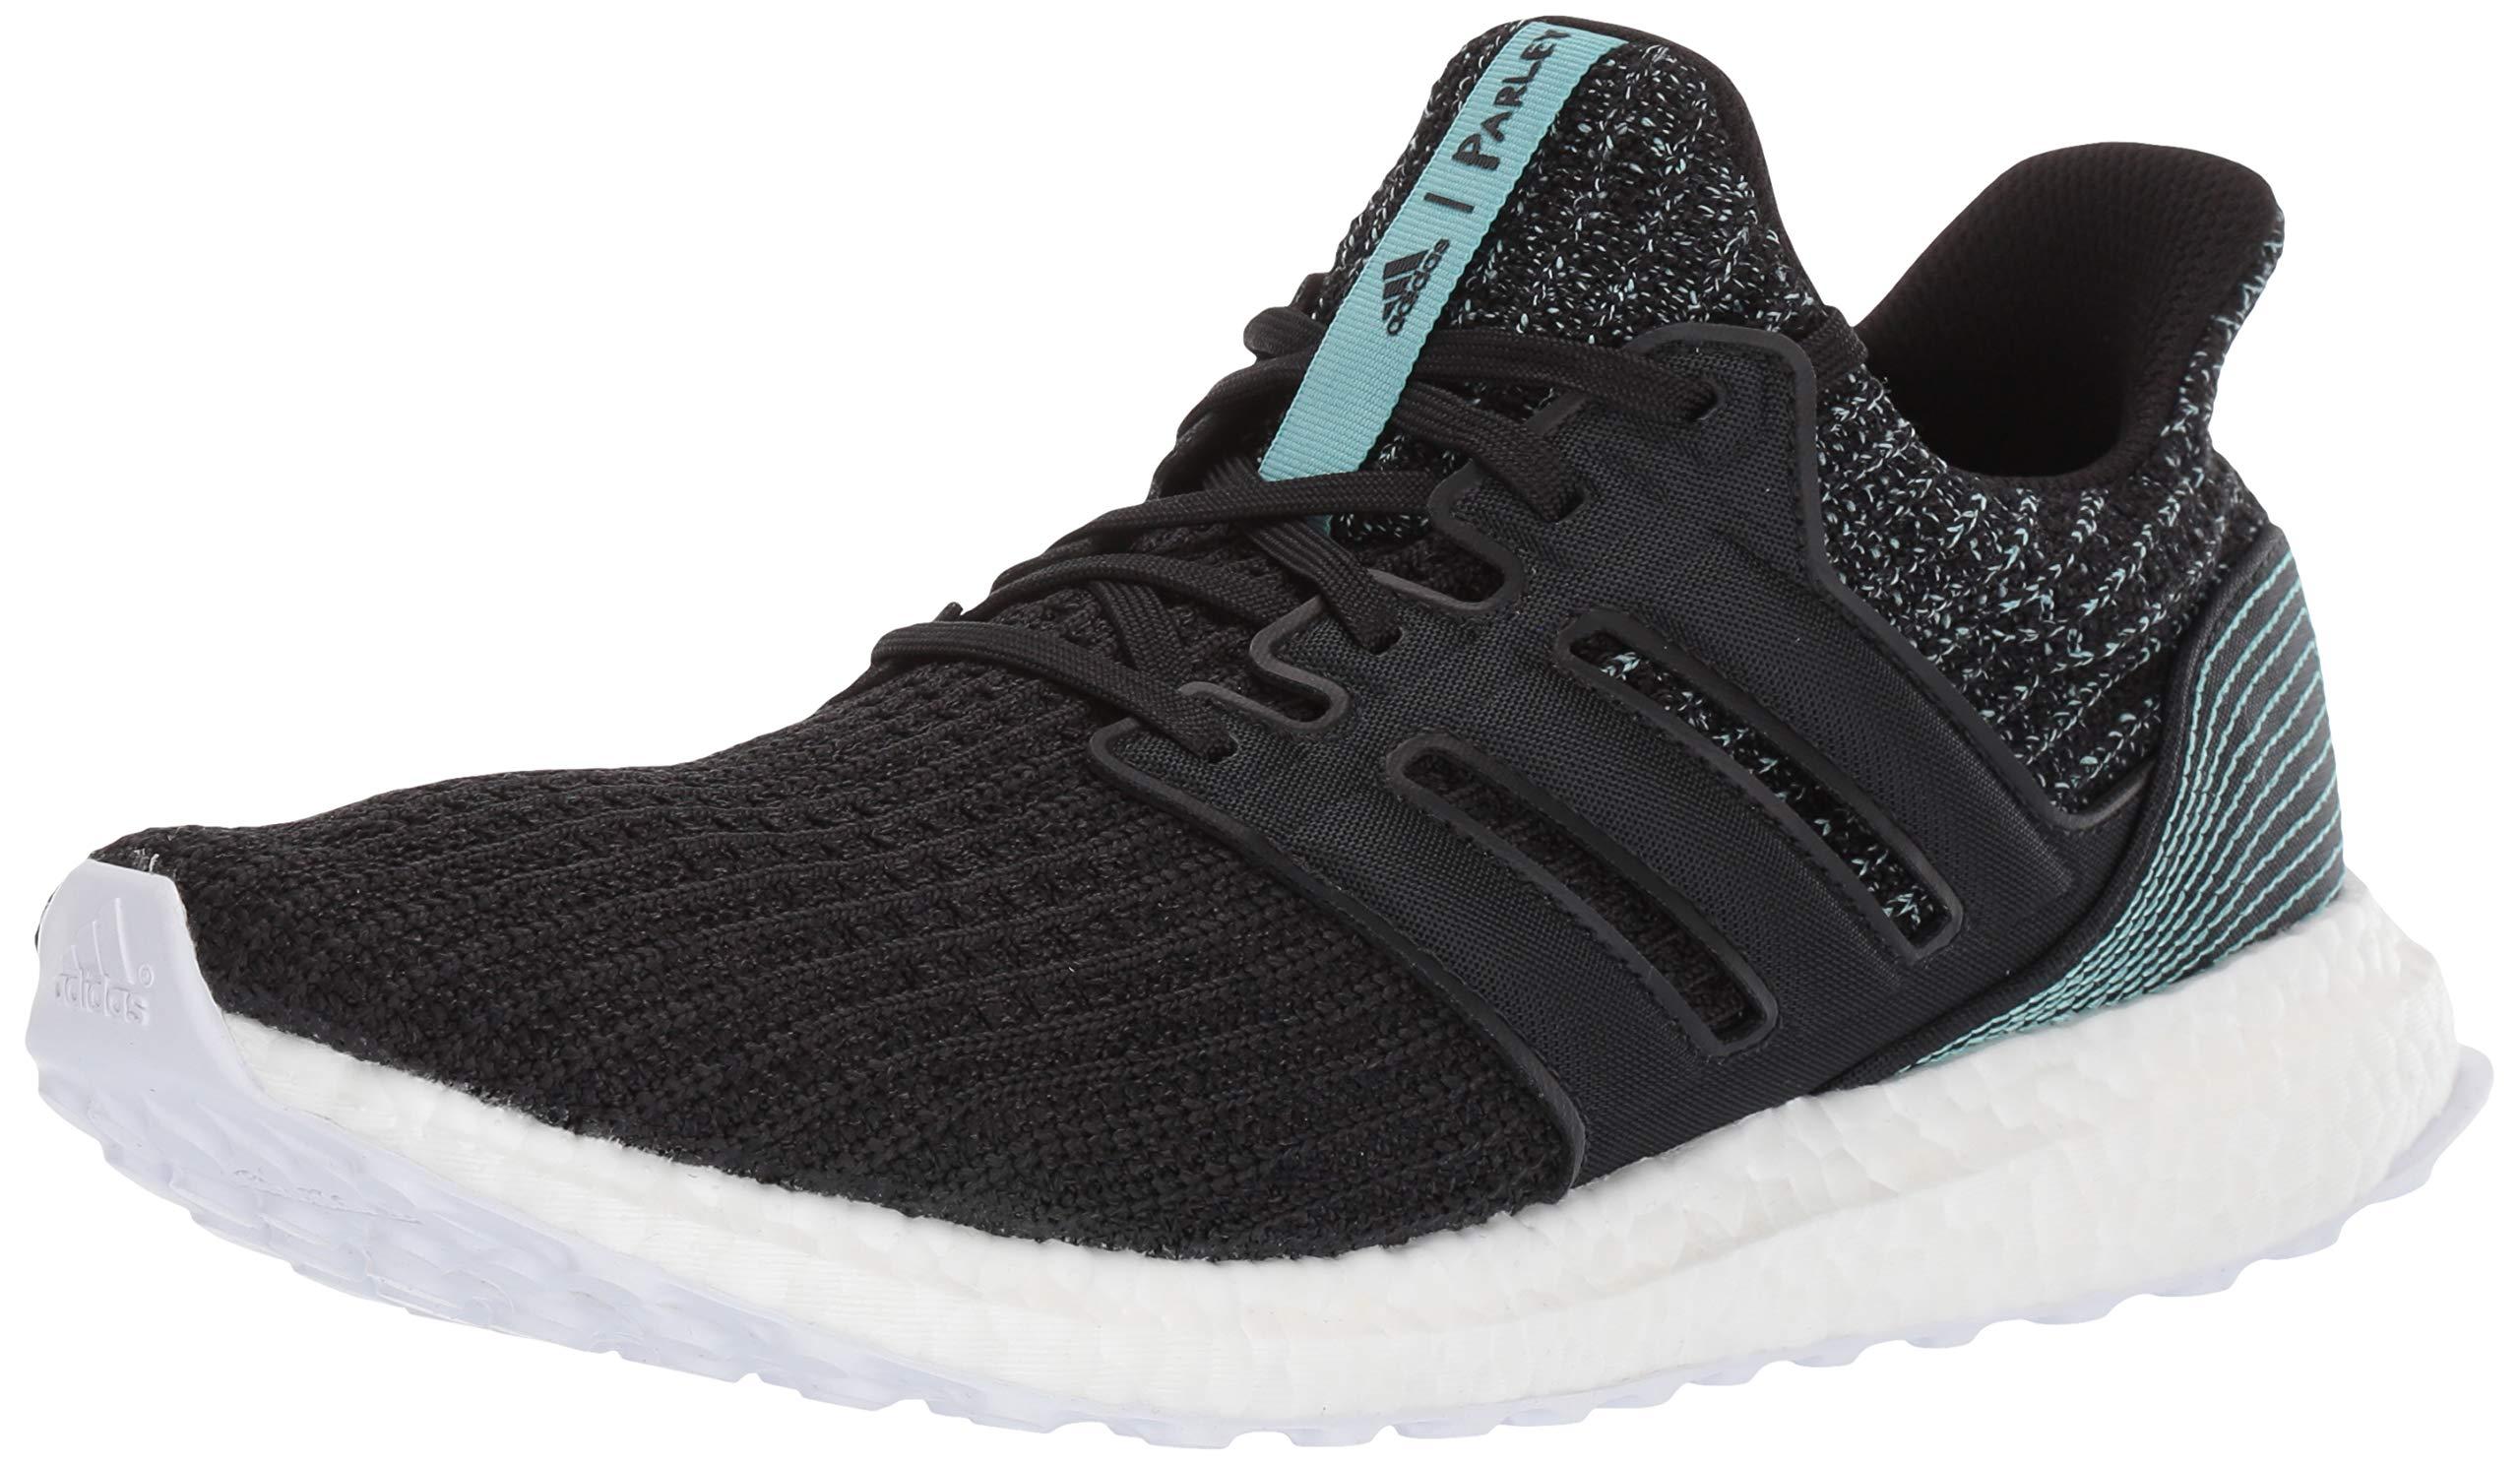 adidas Men's Ultraboost Parley Running Shoe, Black/White, 6.5 M US